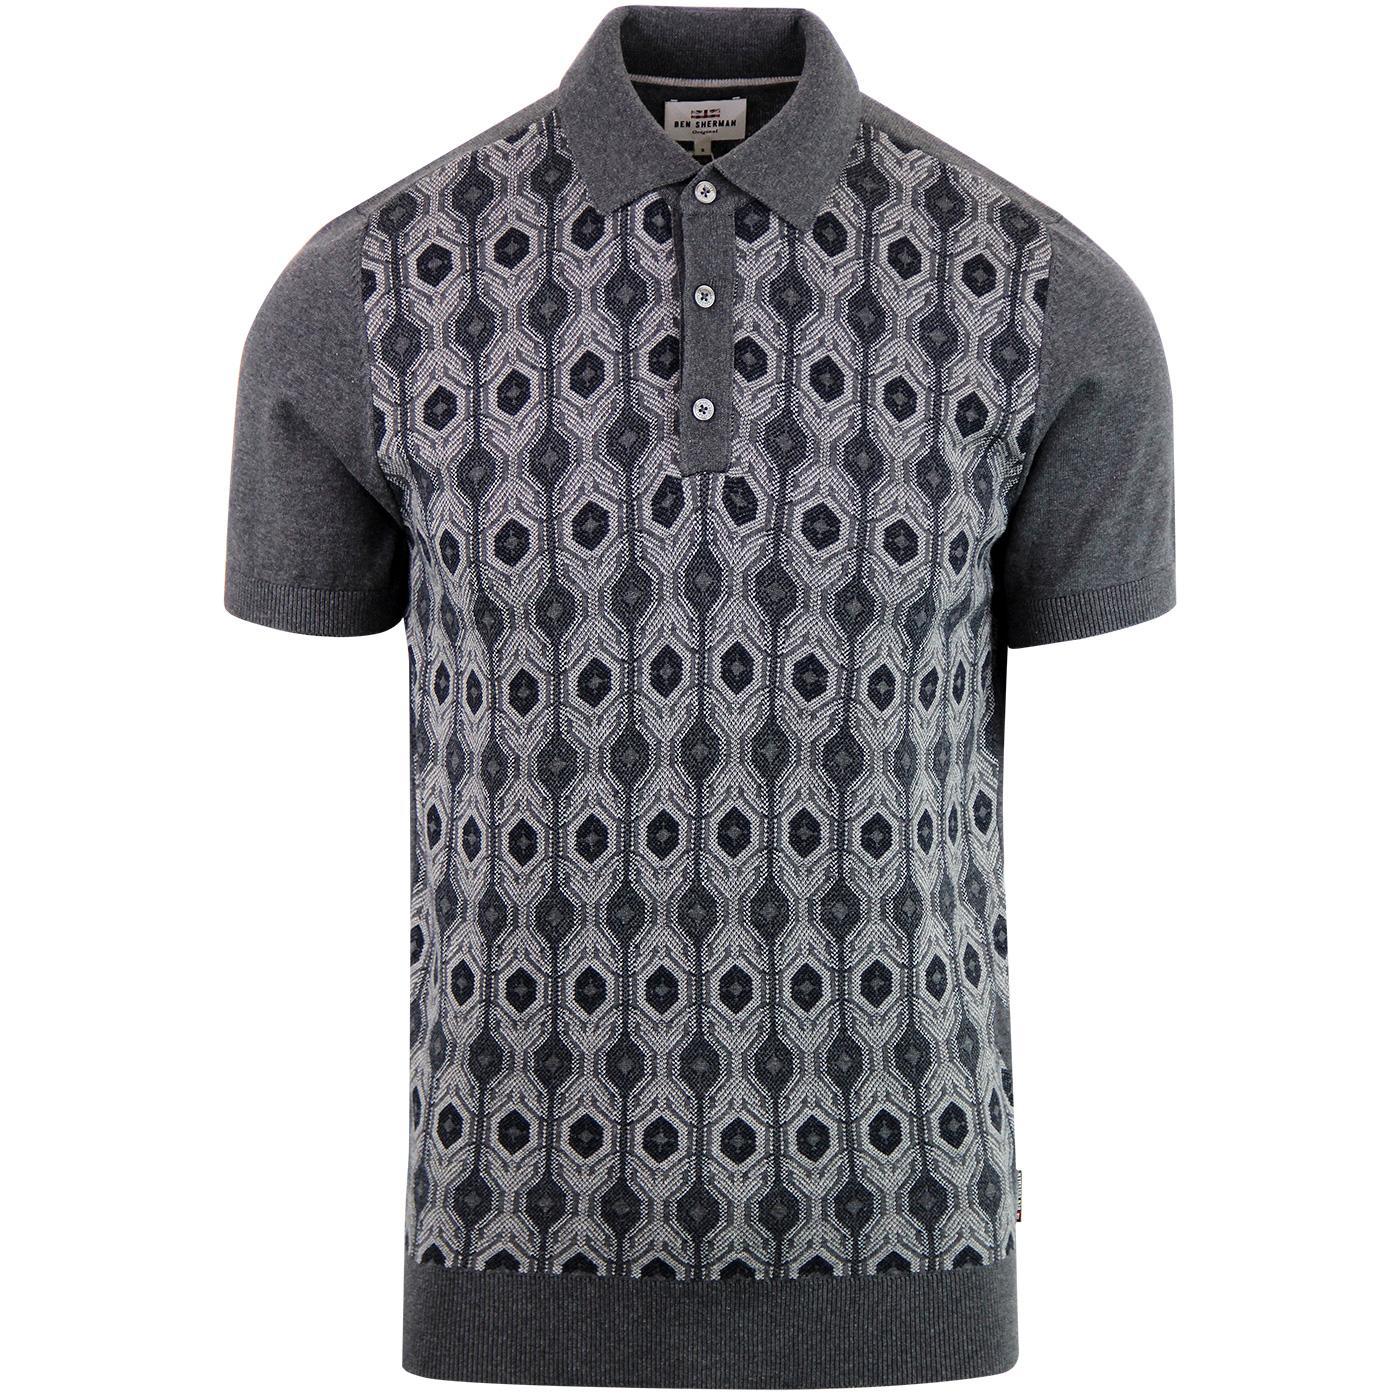 BEN SHERMAN Mod Birdseye Jacquard Knitted Polo (G)